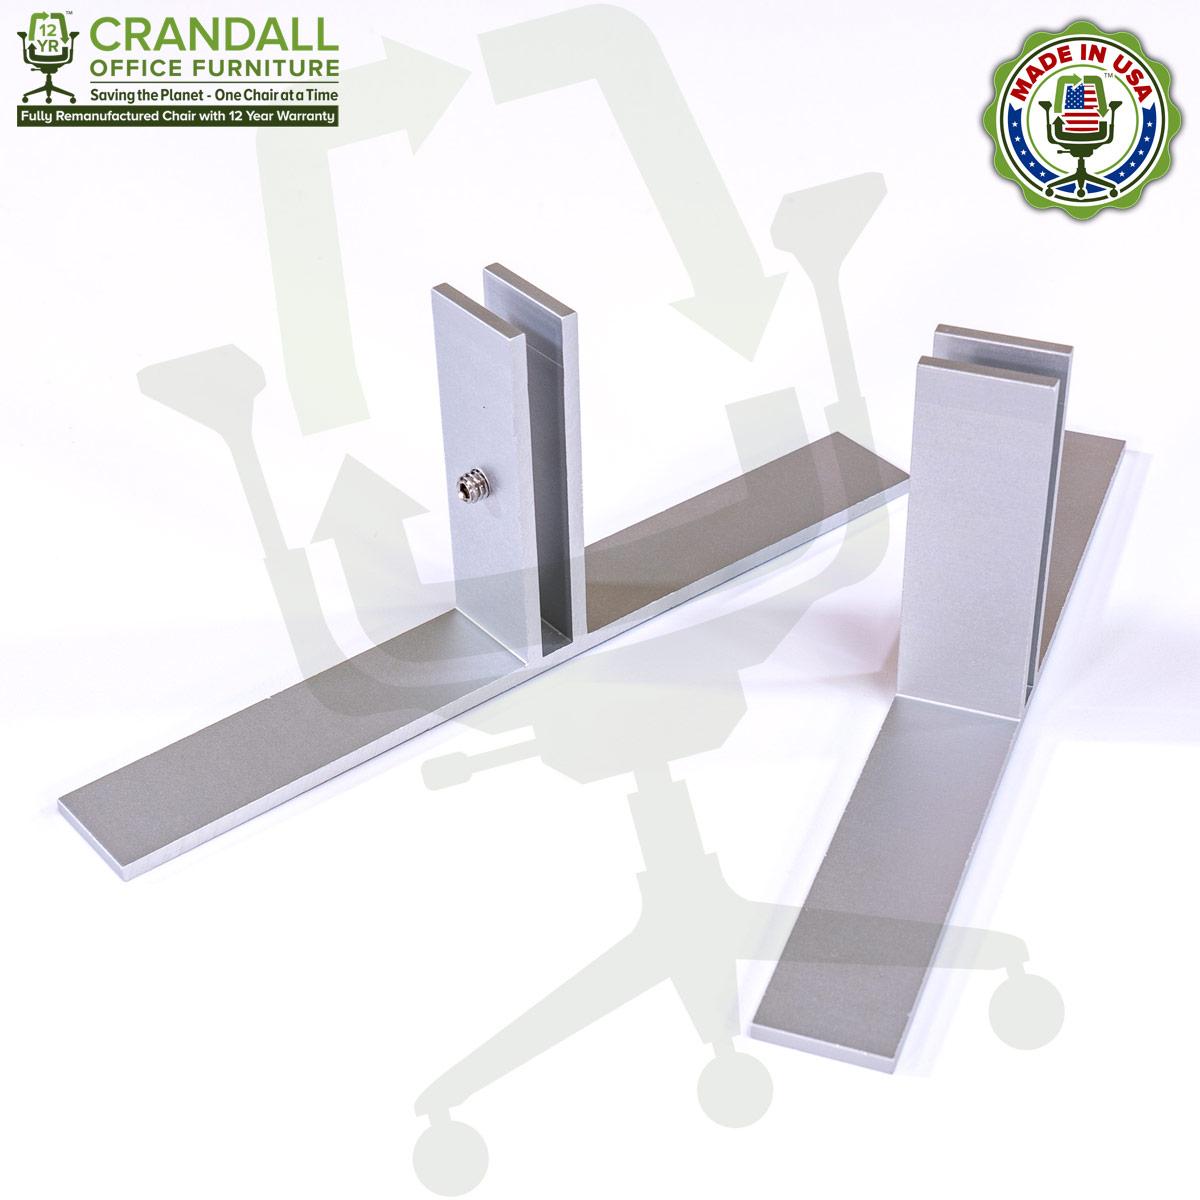 Table Top Free Standing Plexiglass & Acrylic Barrier Brackets 0001